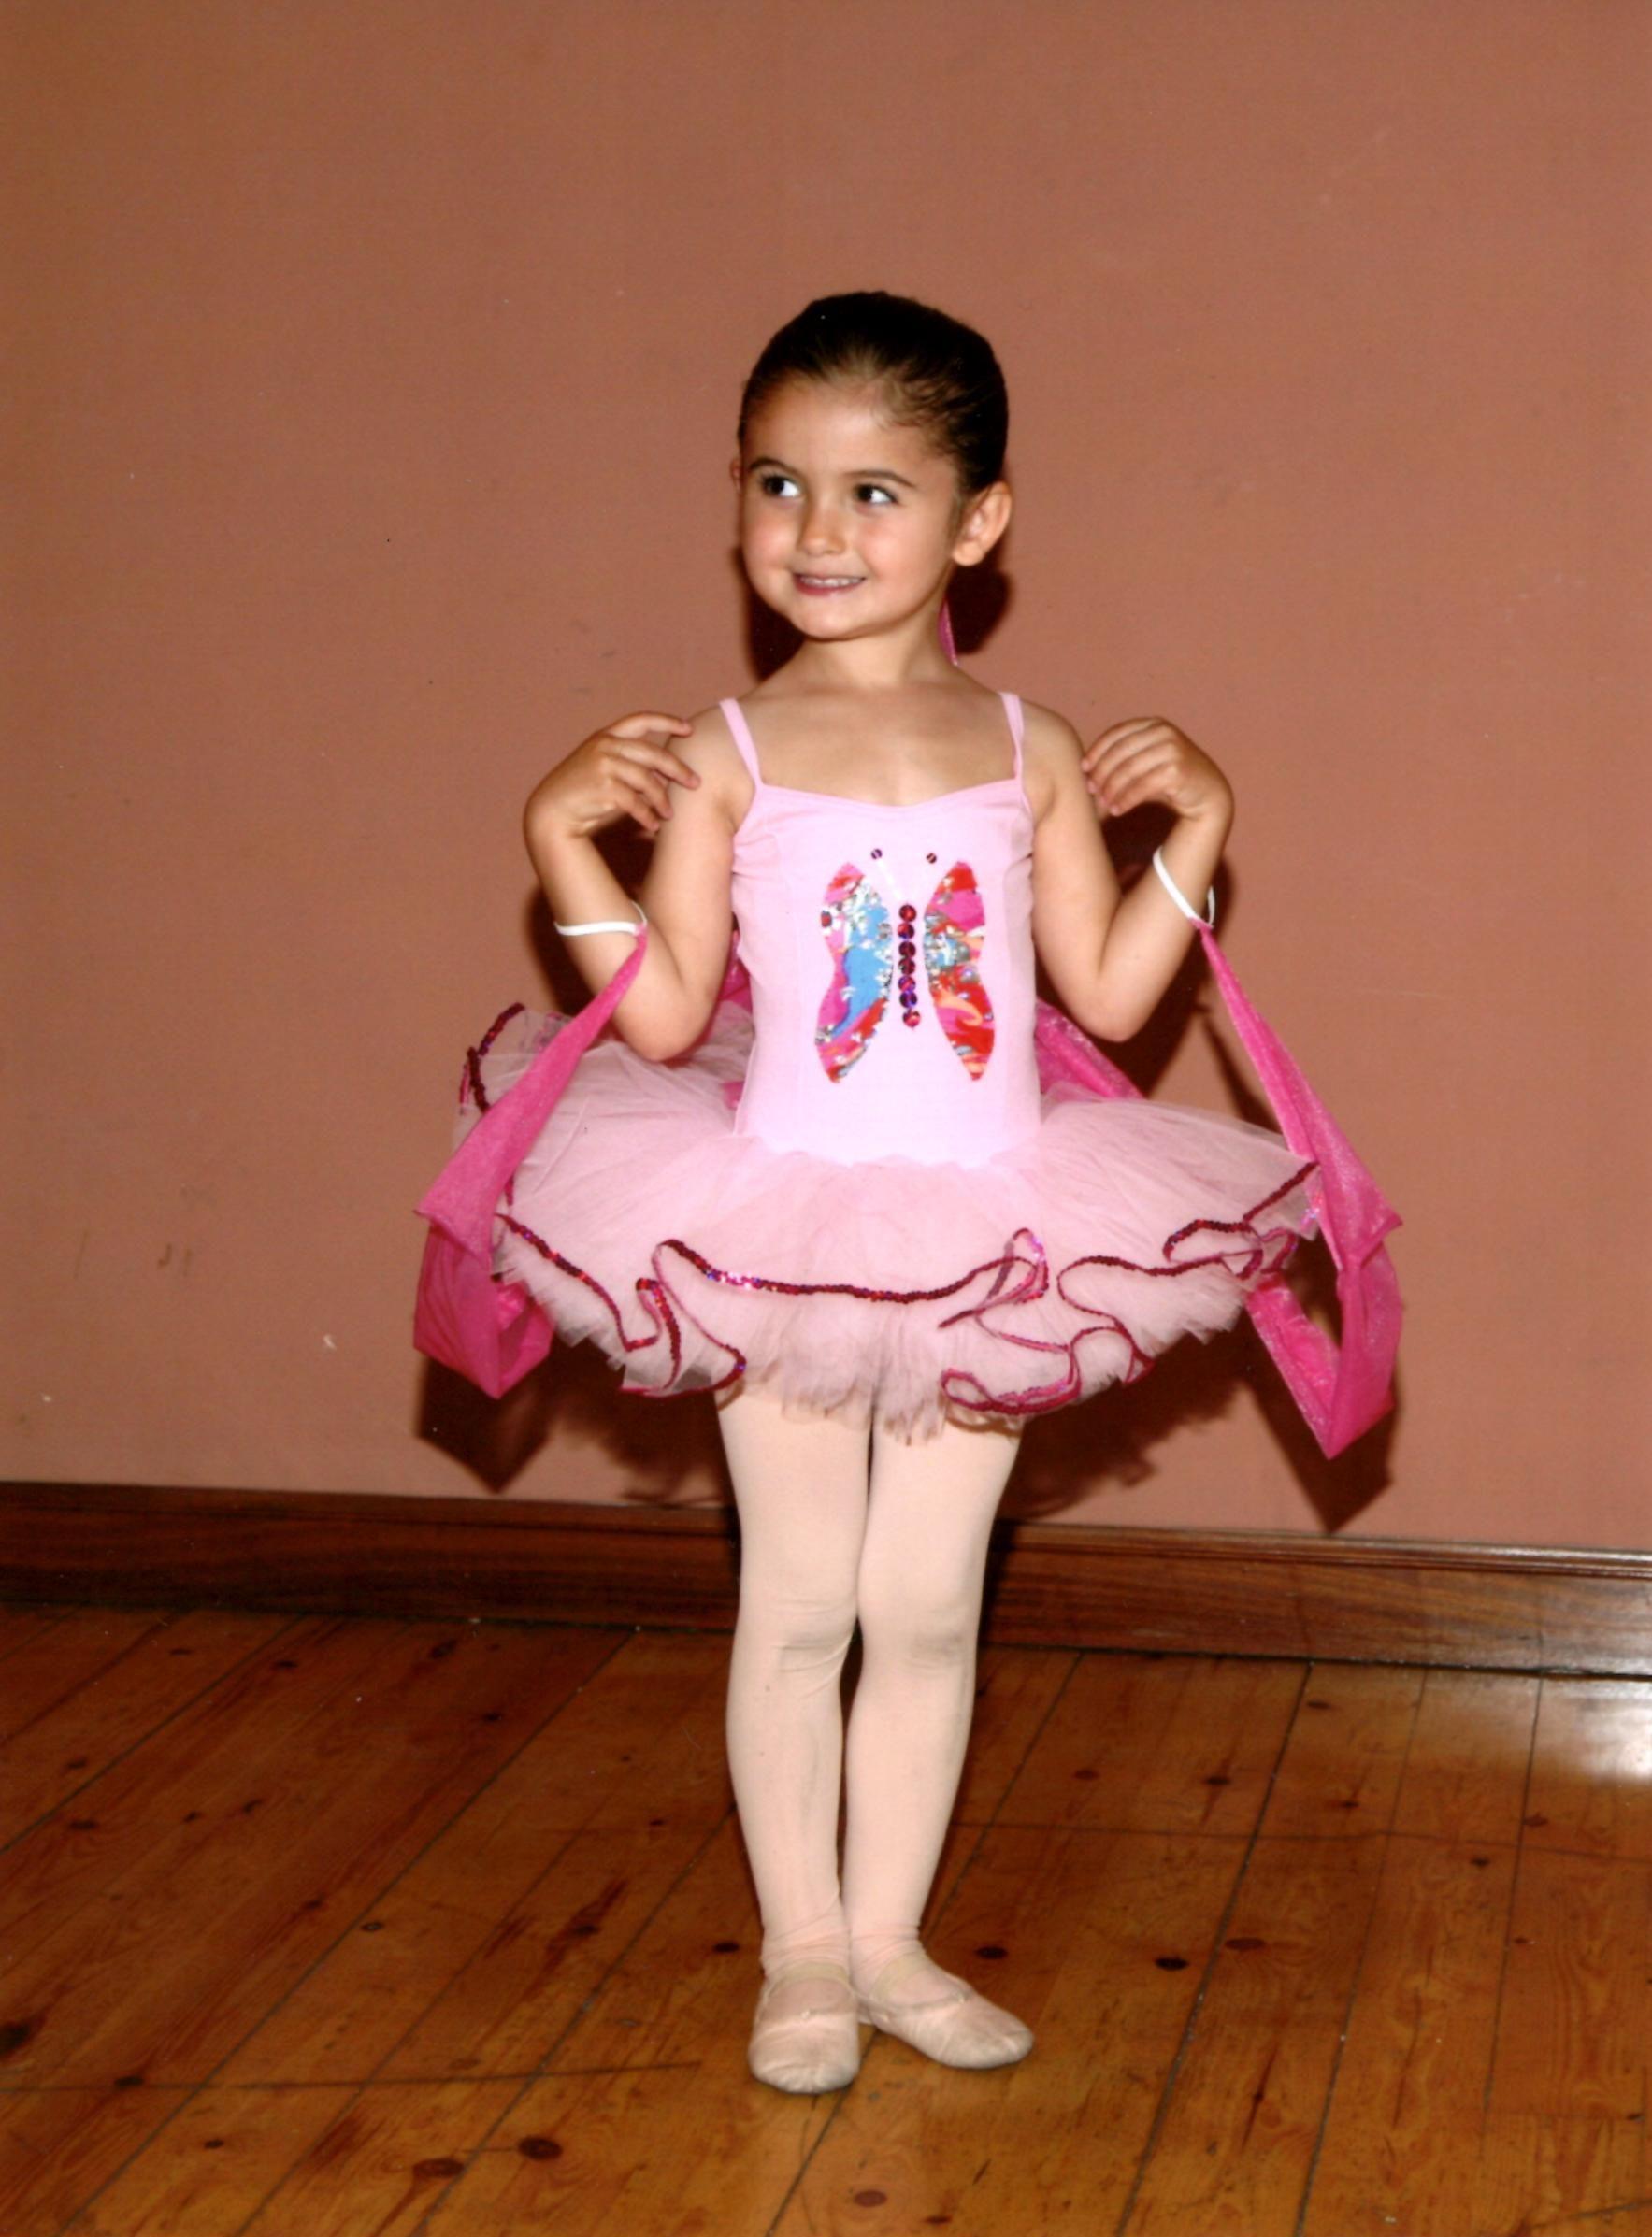 Foto 29 de Escuelas de música, danza e interpretación en Bilbao   Estudio de Ballet Ana Mª Aurrecoechea